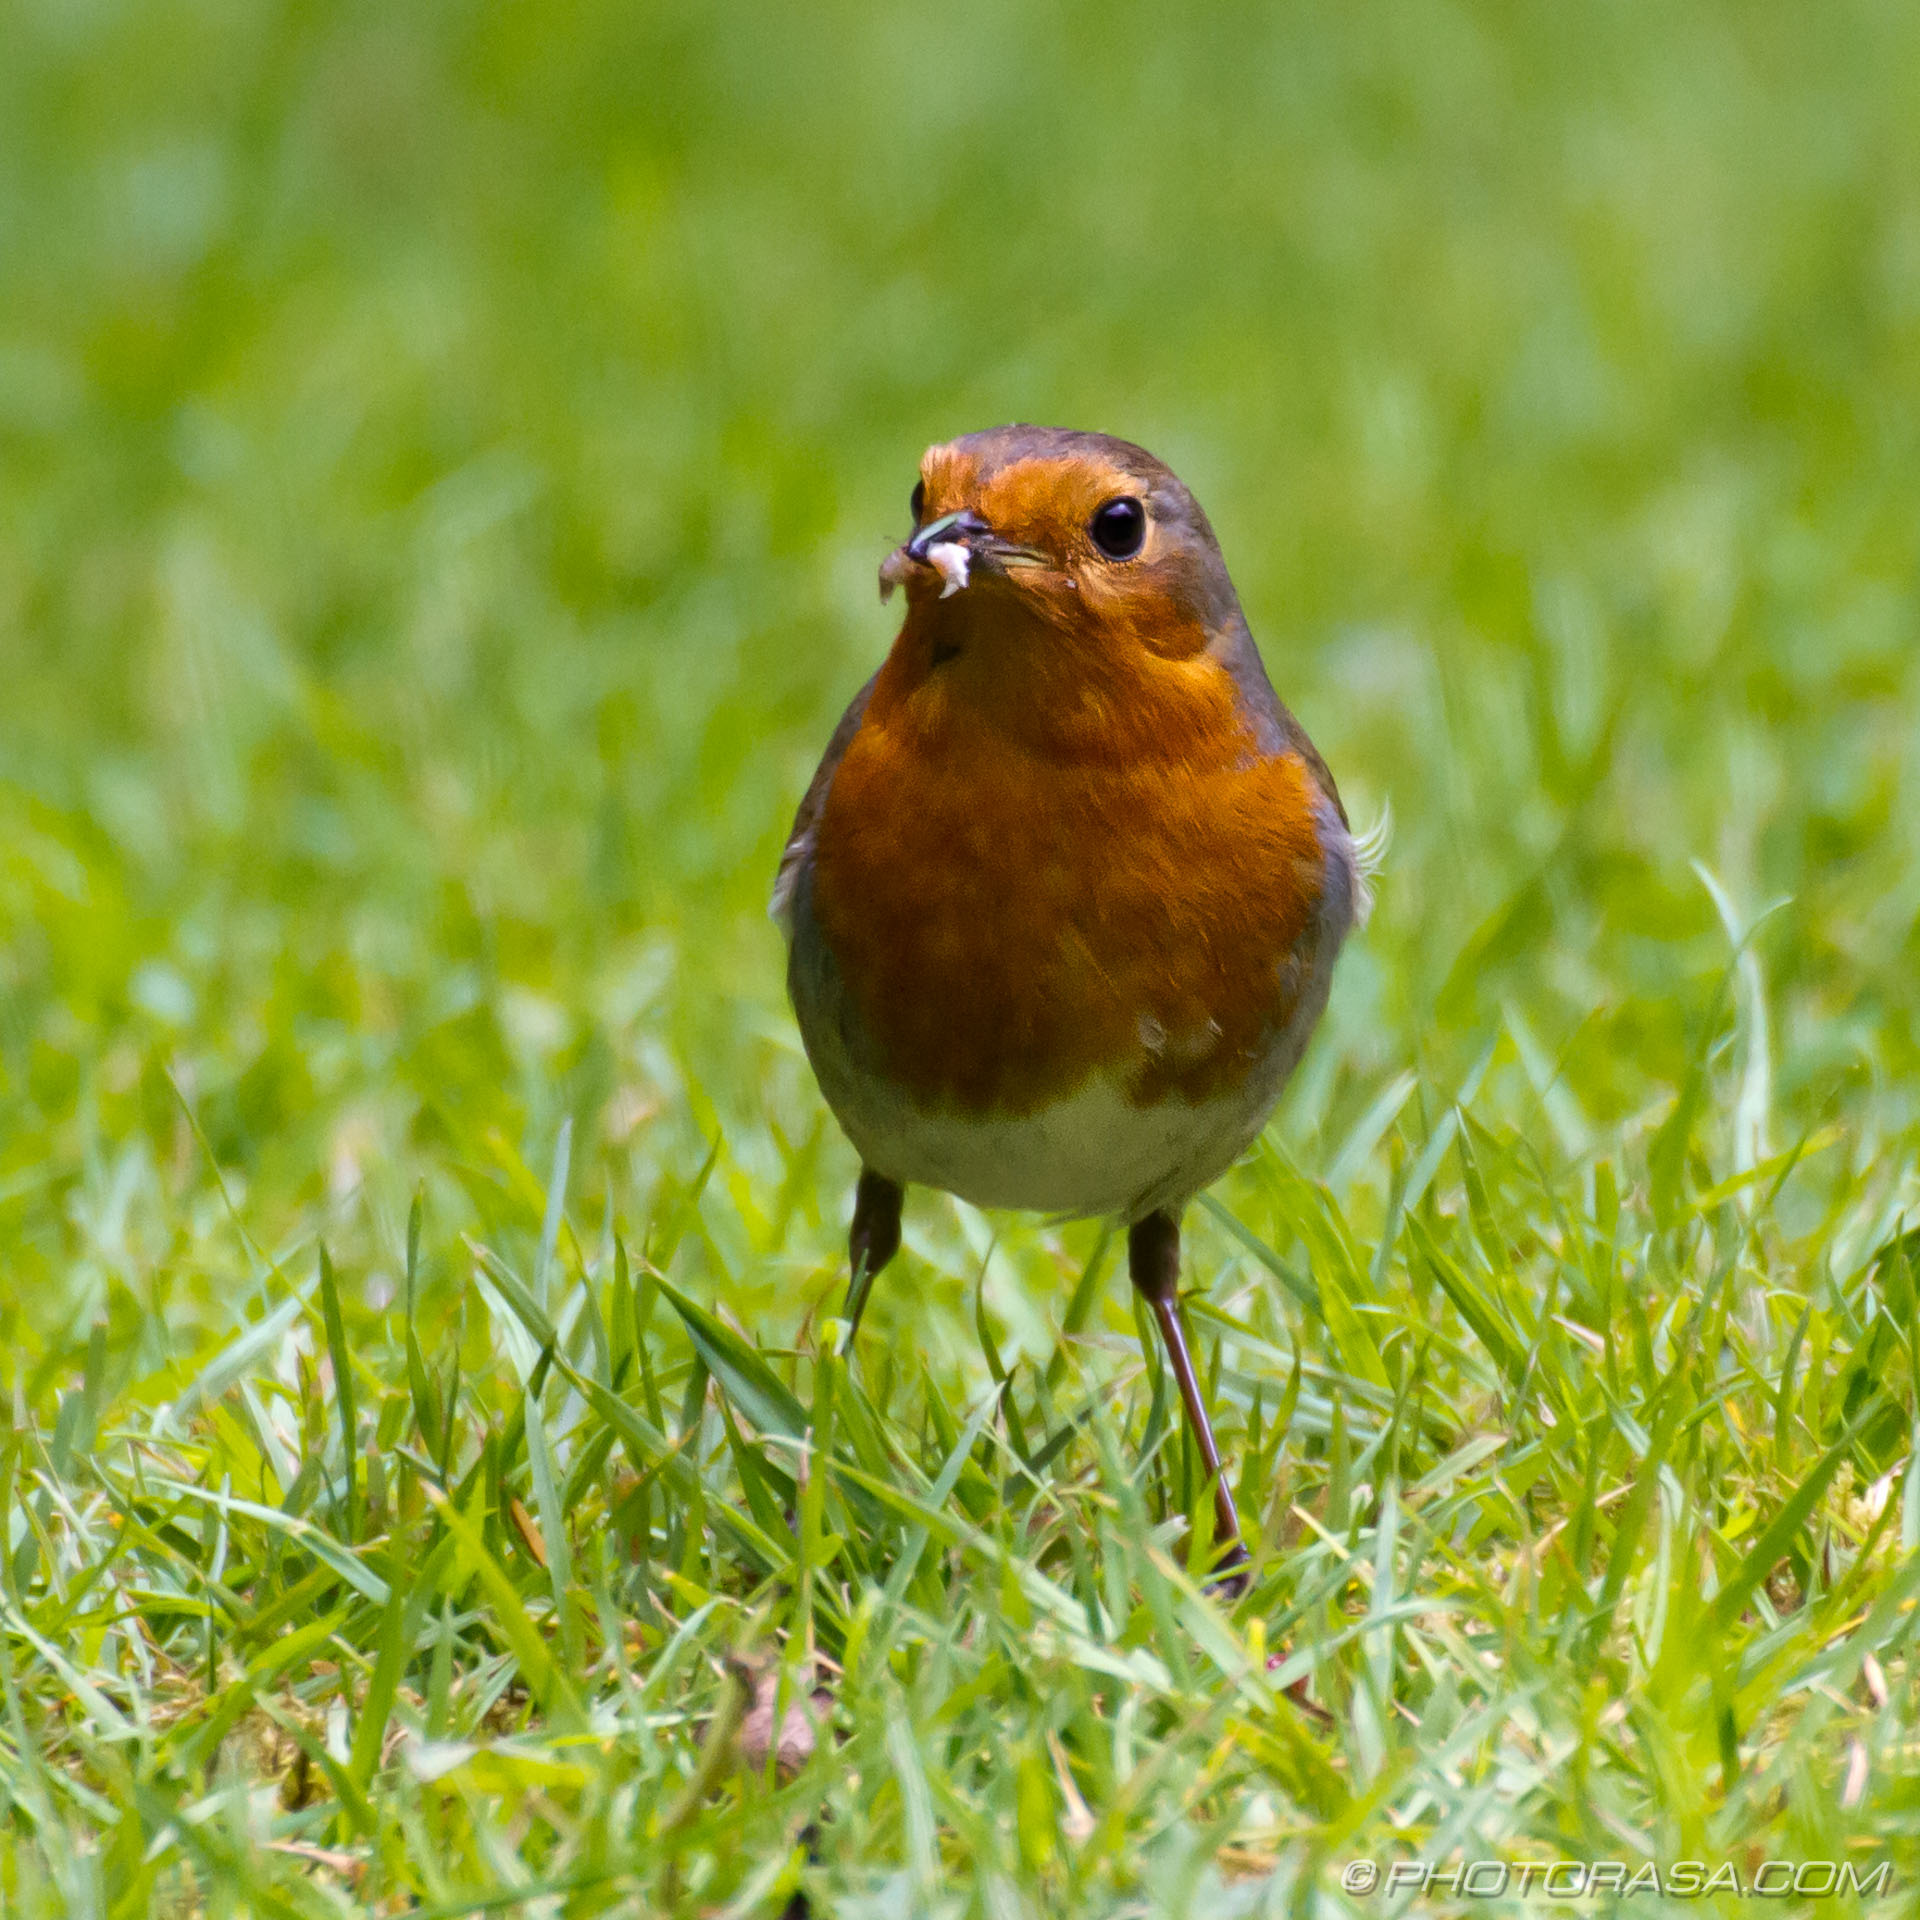 https://photorasa.com/robins/robin-with-food-in-beak/